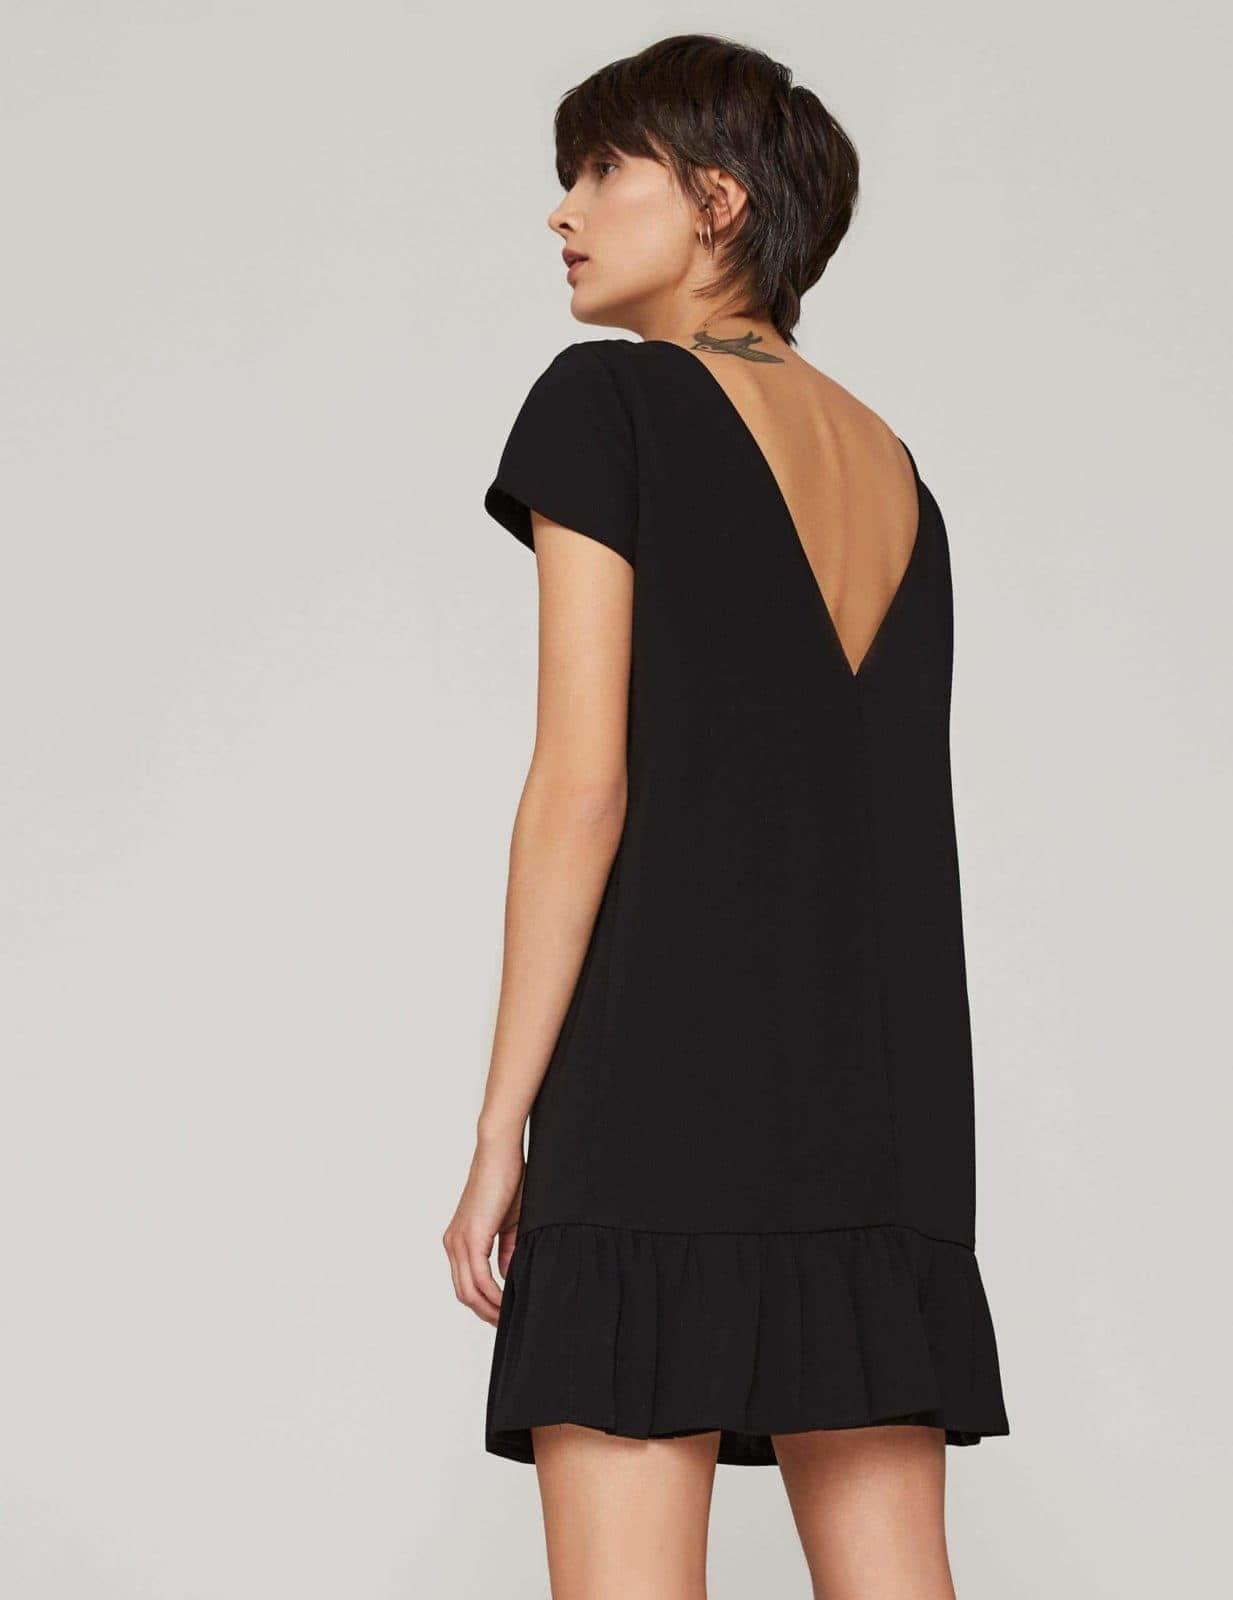 sukienka-z-dekoltem-v-czarna-02